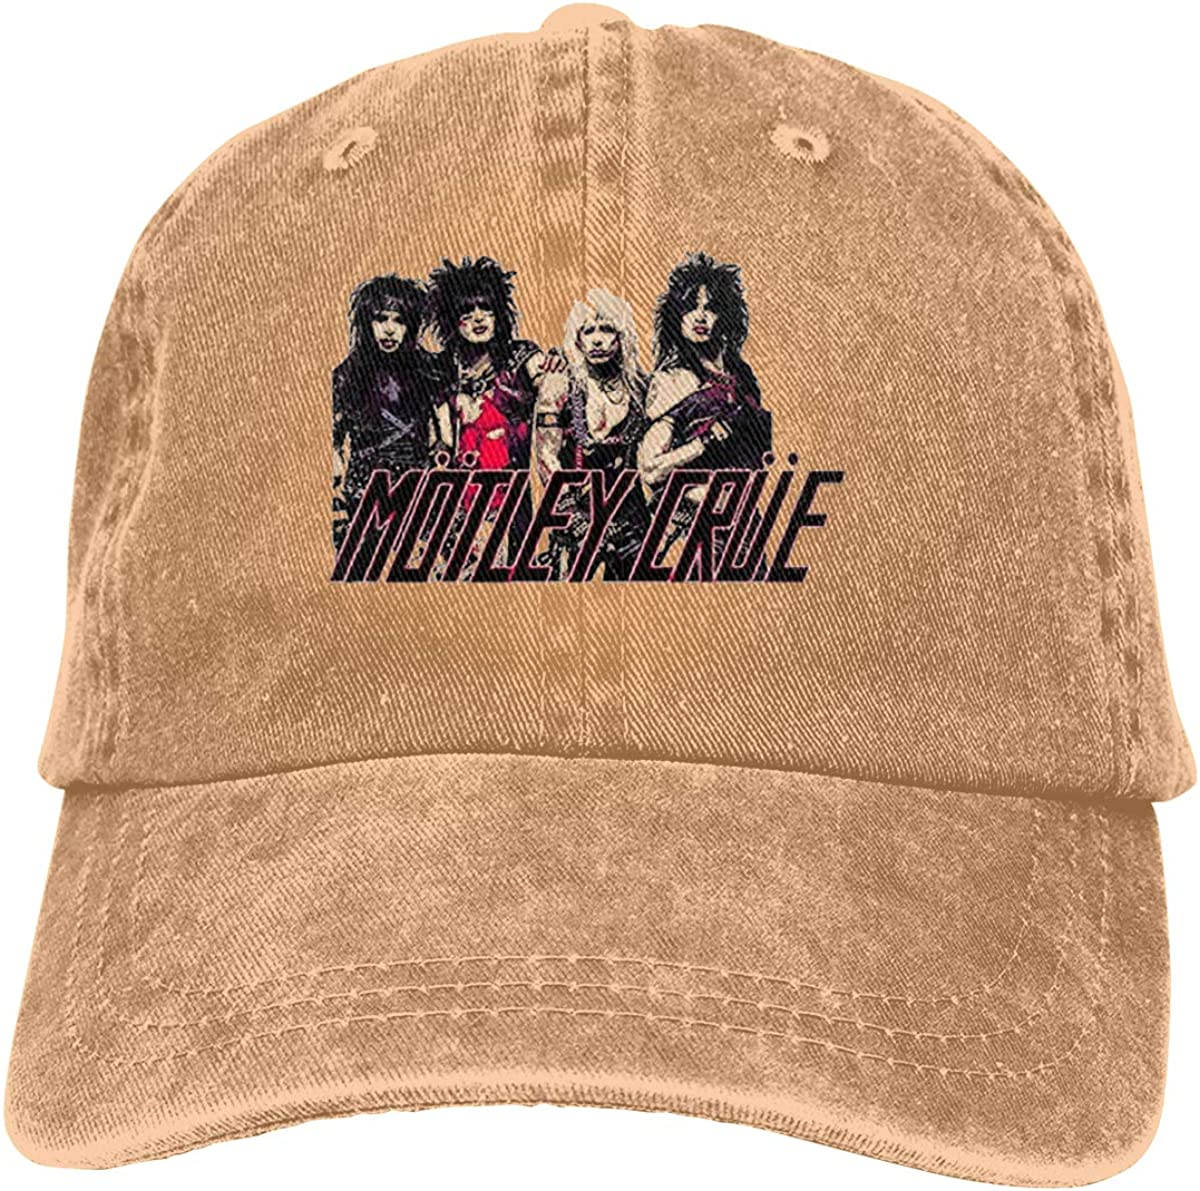 Zlizhi The Dirt Soundtrack Motley Crue Men Women Plain Cotton Adjustable Washed Twill Low Profile Baseball Cap Hat